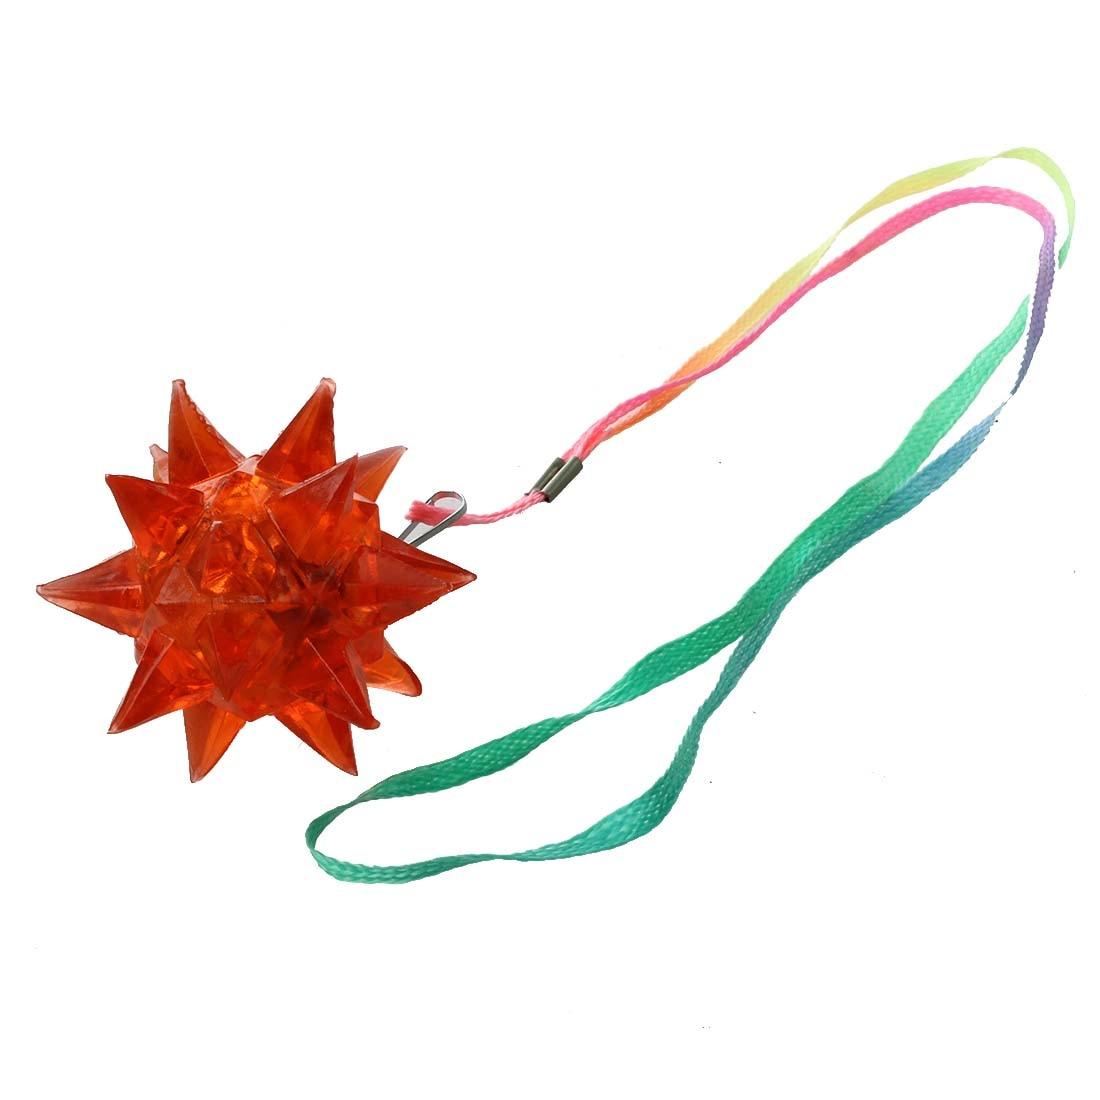 New Light-Up Flashing Star LED Ball Pendant Necklace